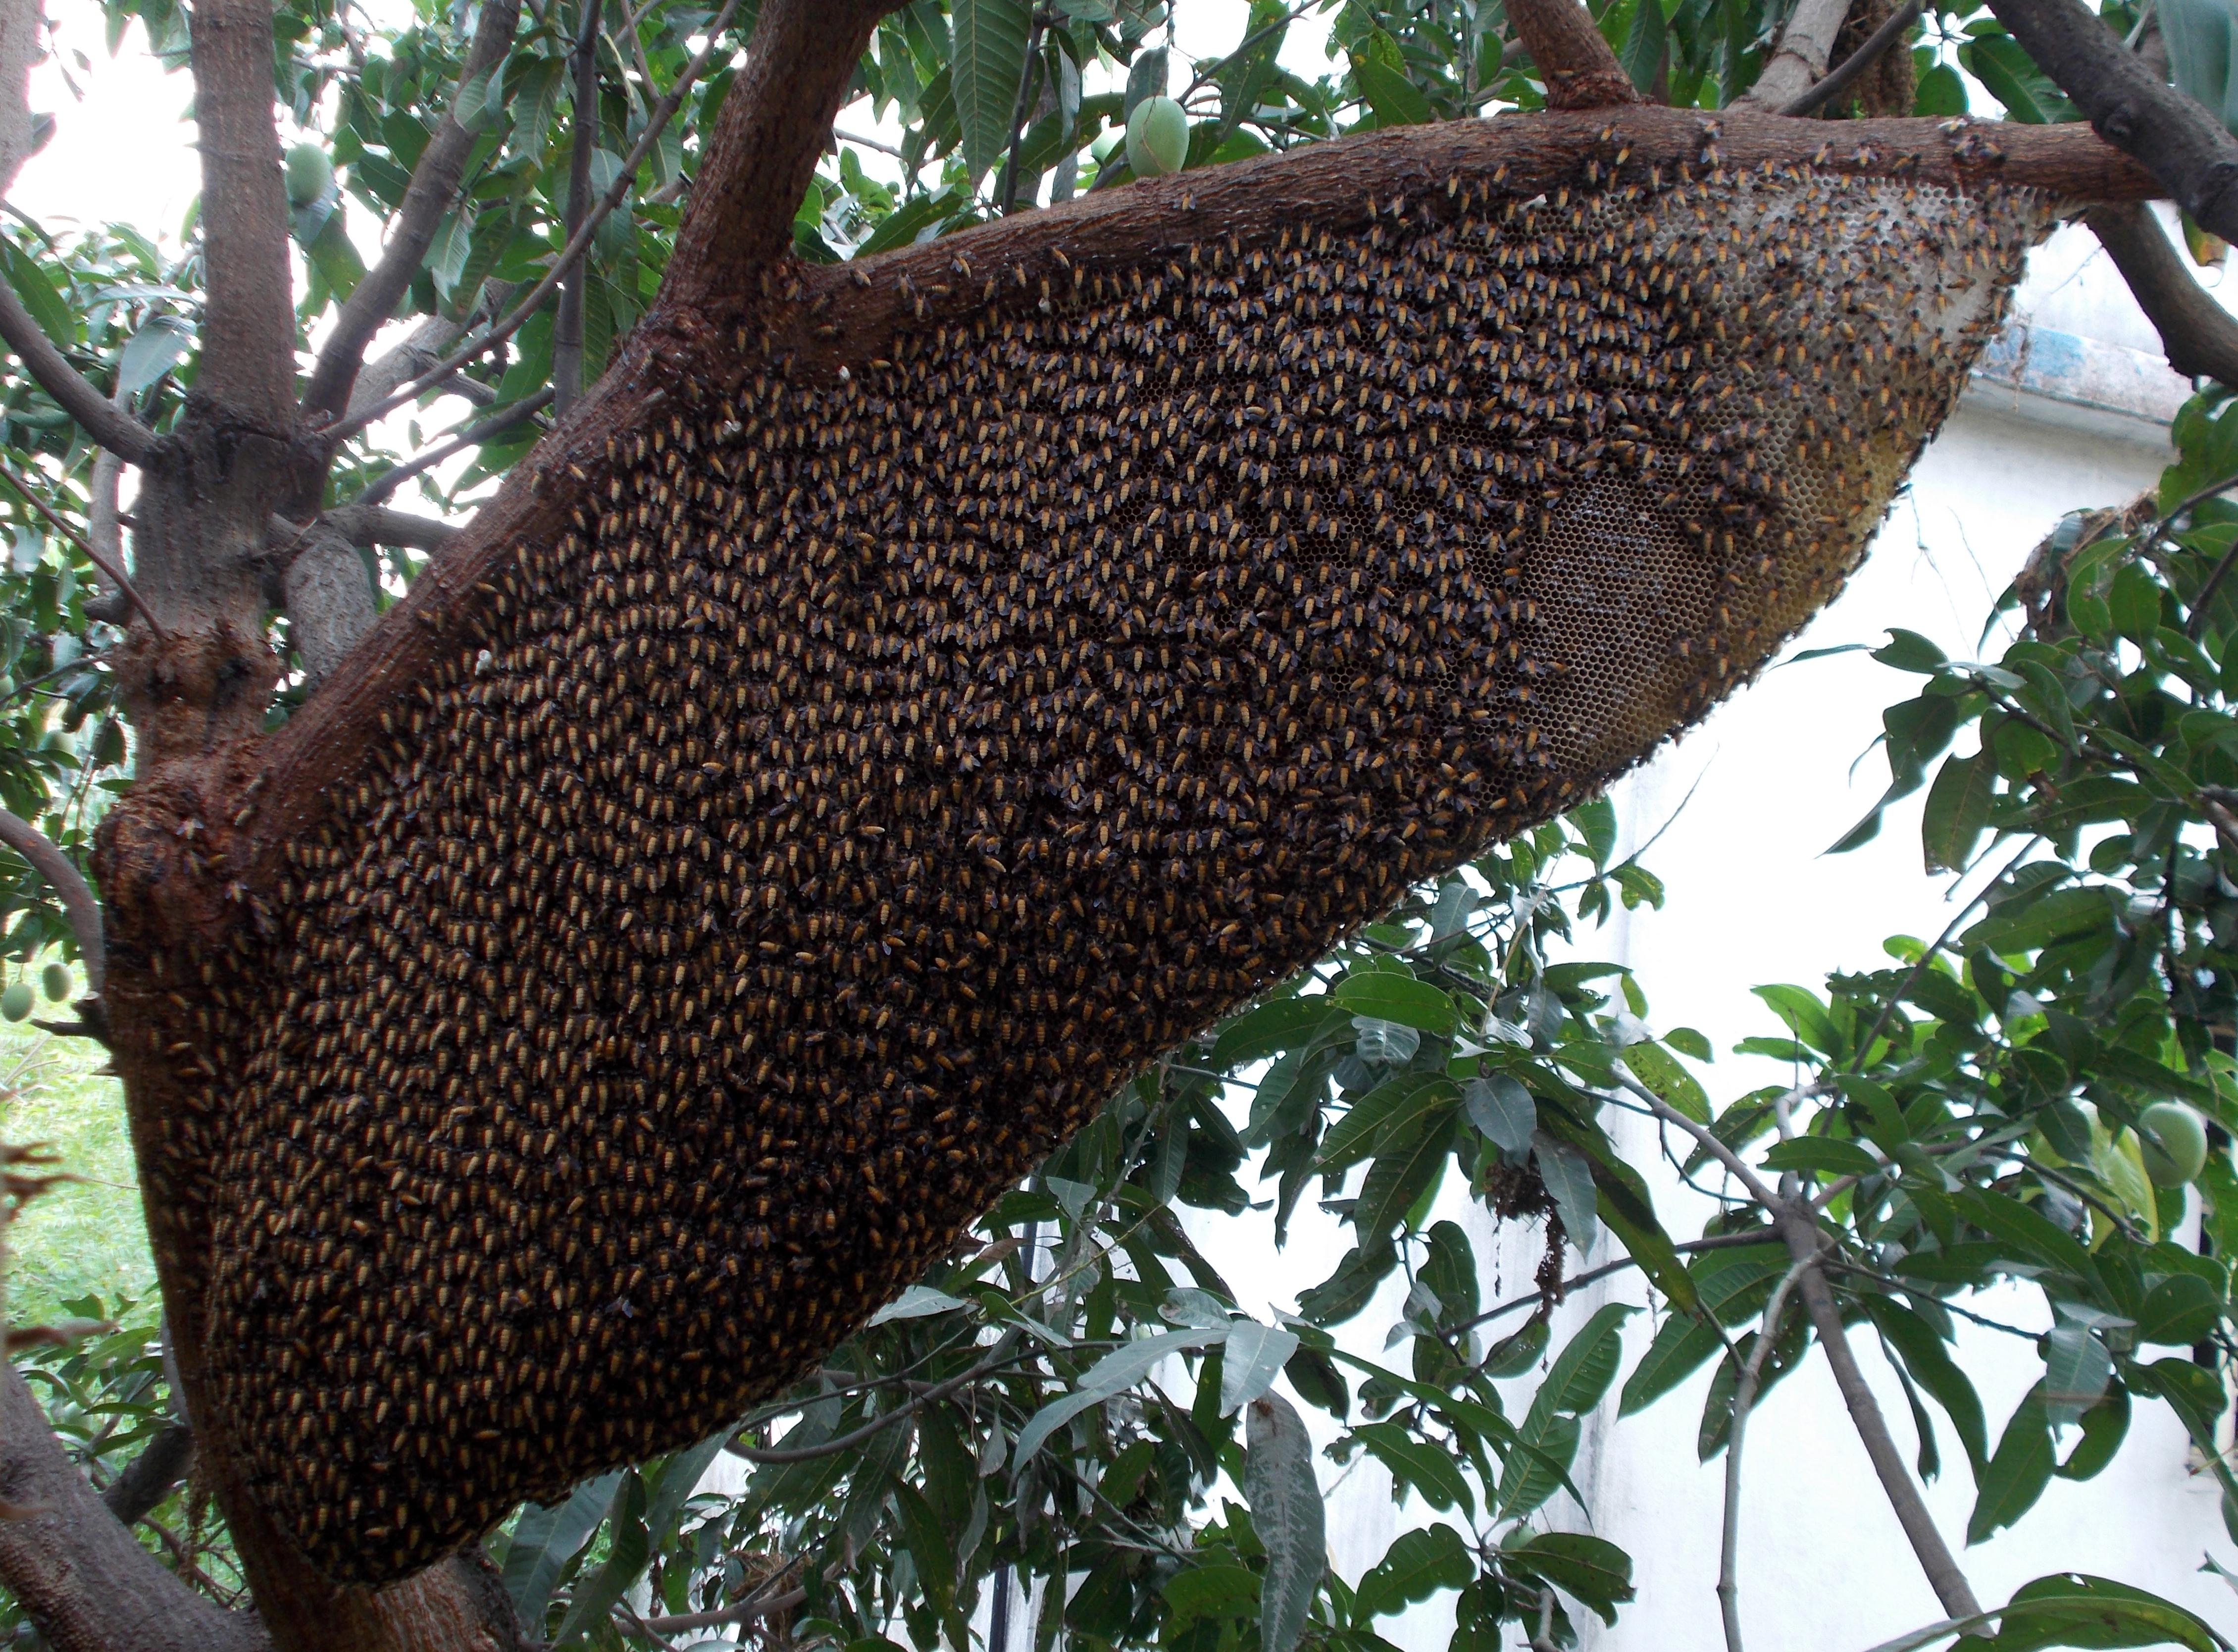 FileA Large HoneycombJPG